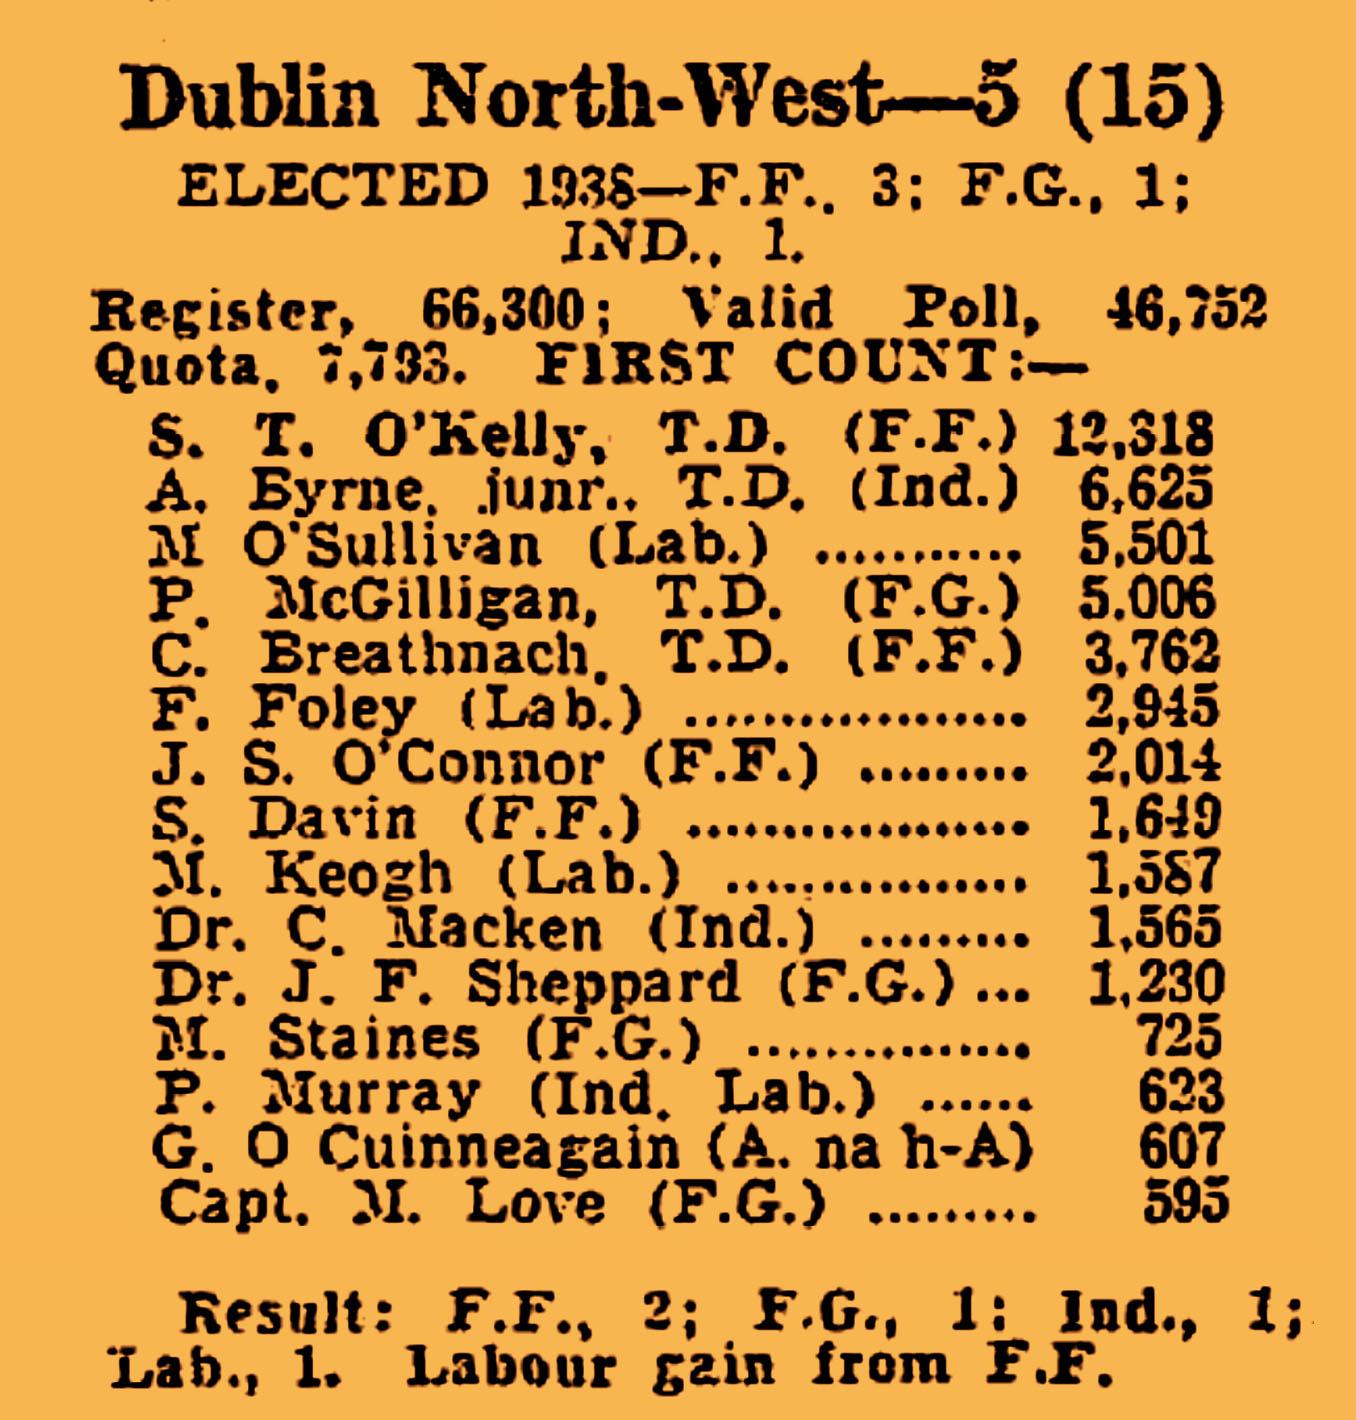 1943 Election Burning of Dublin Custom House 1921